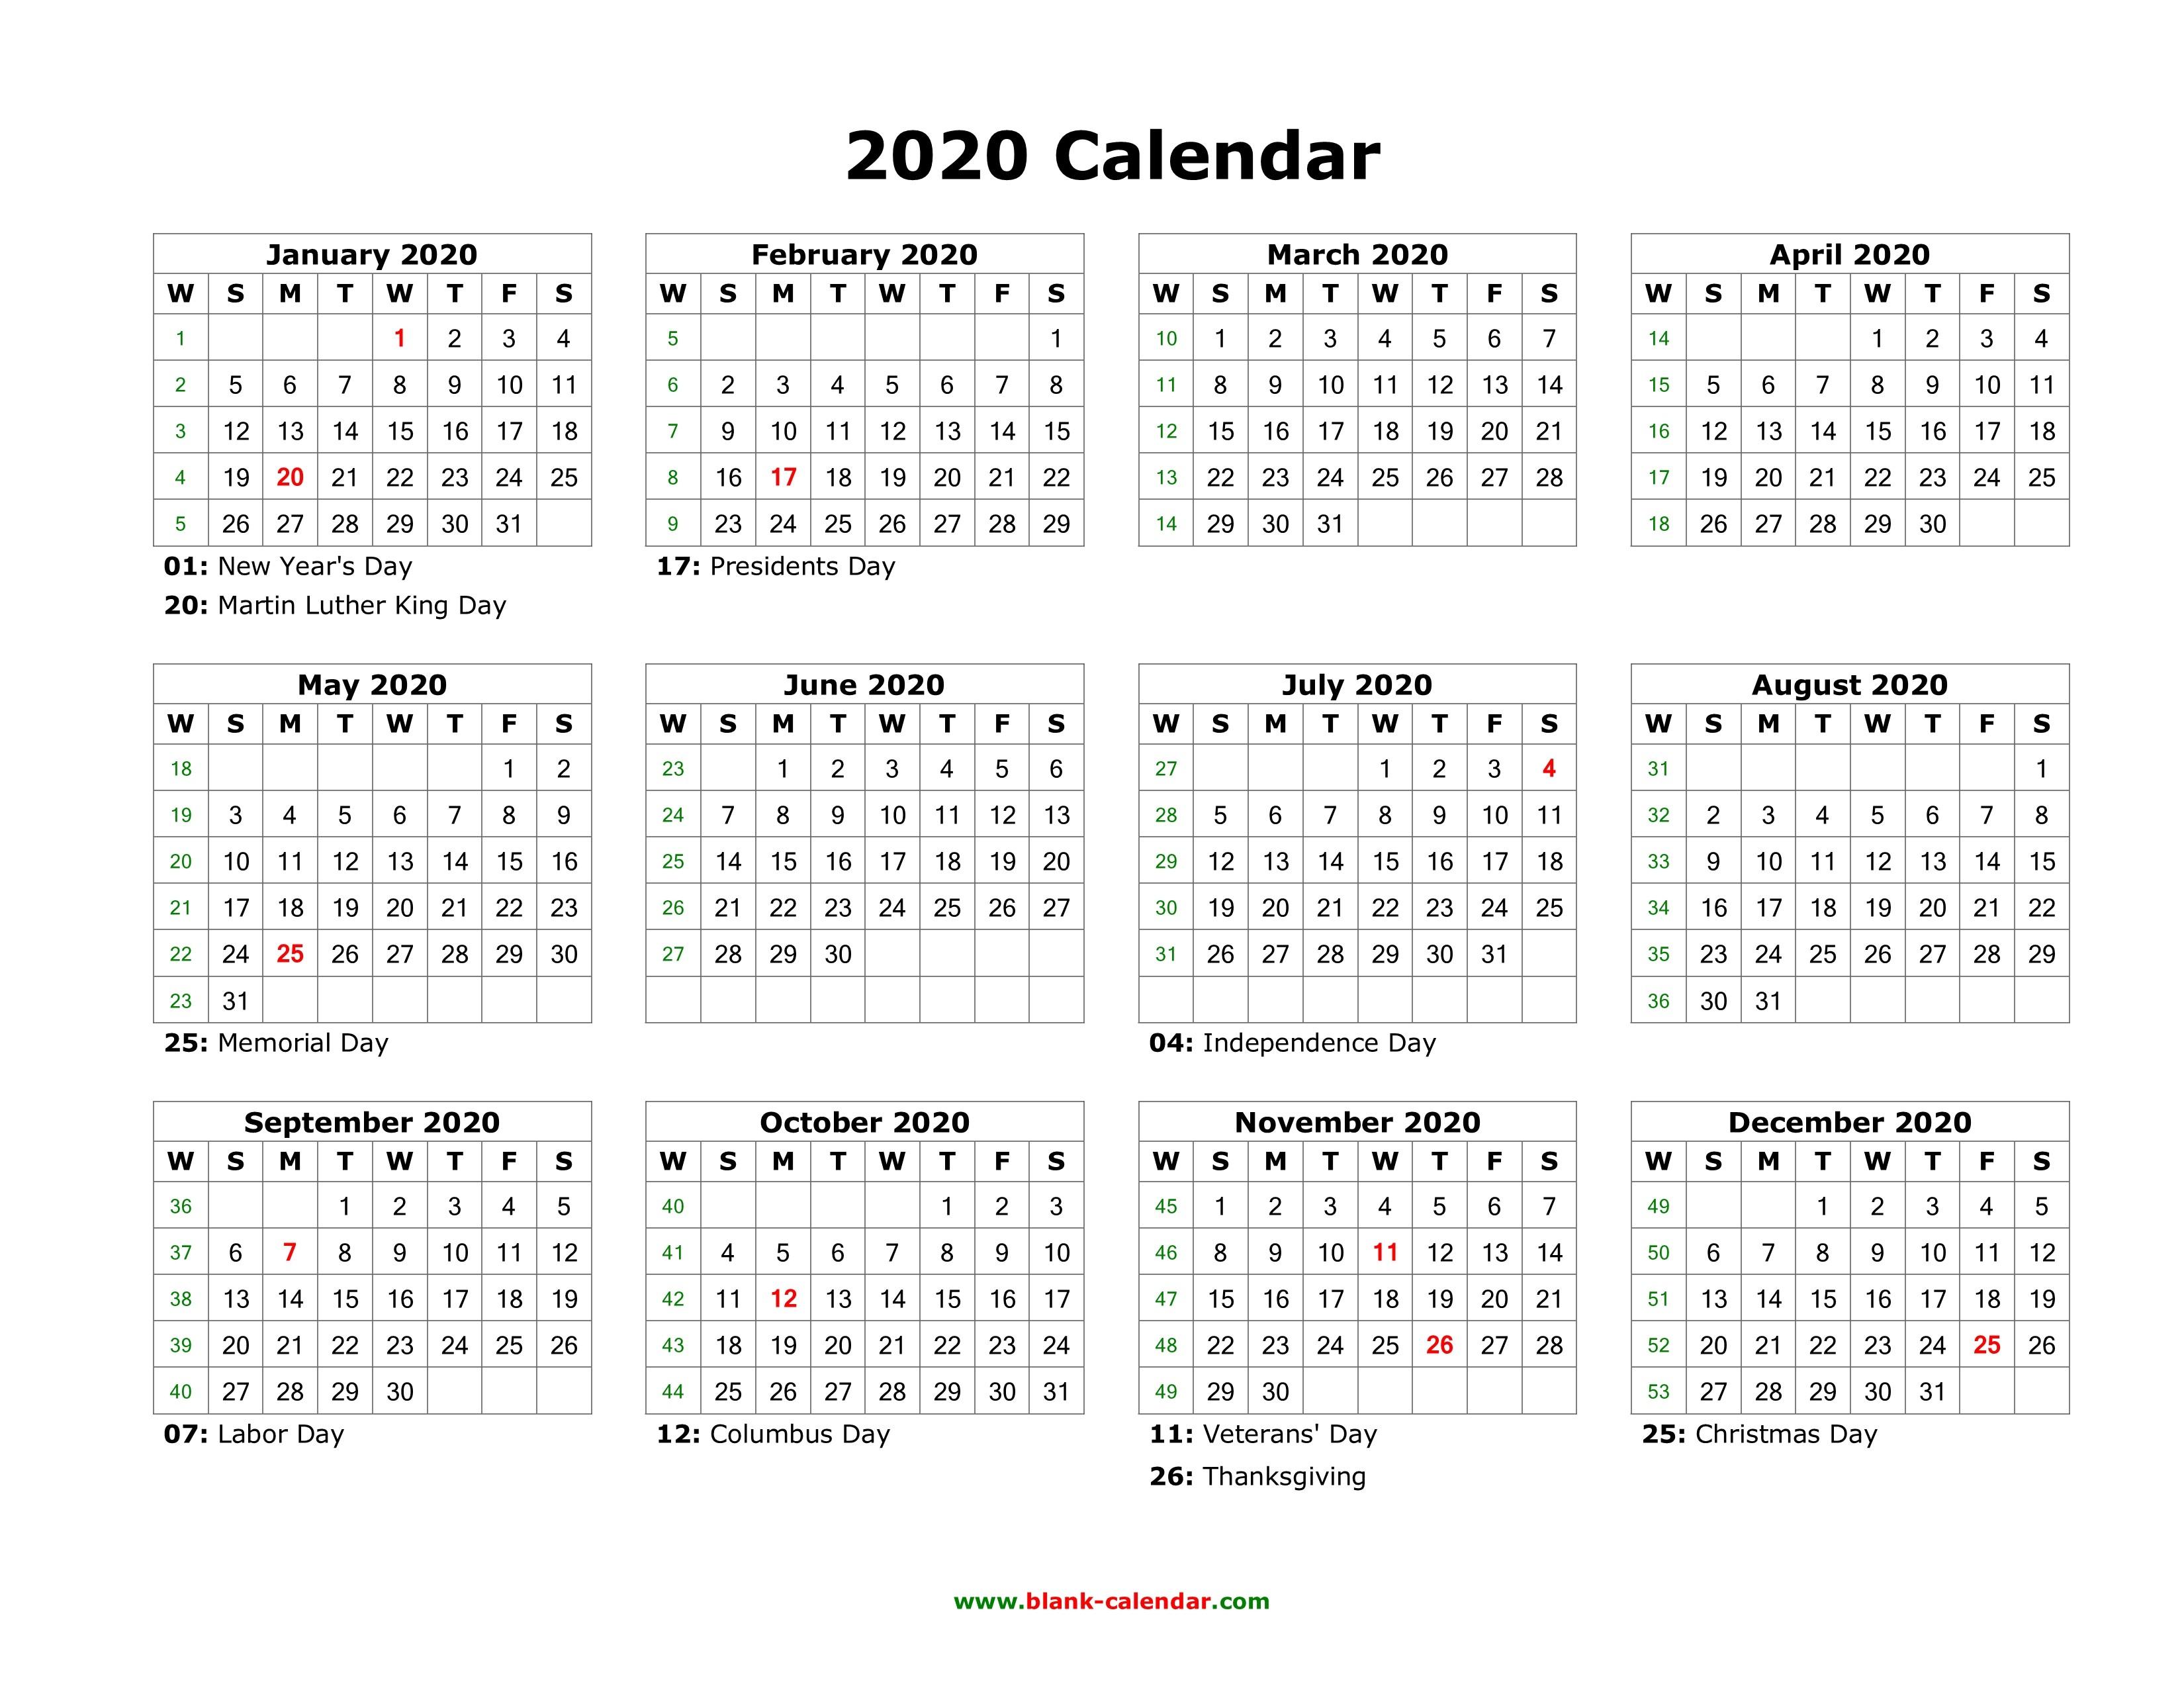 Calendar 2020 Printable Pdf Download Blank Calendar 2020 with Us Holidays 12 Months